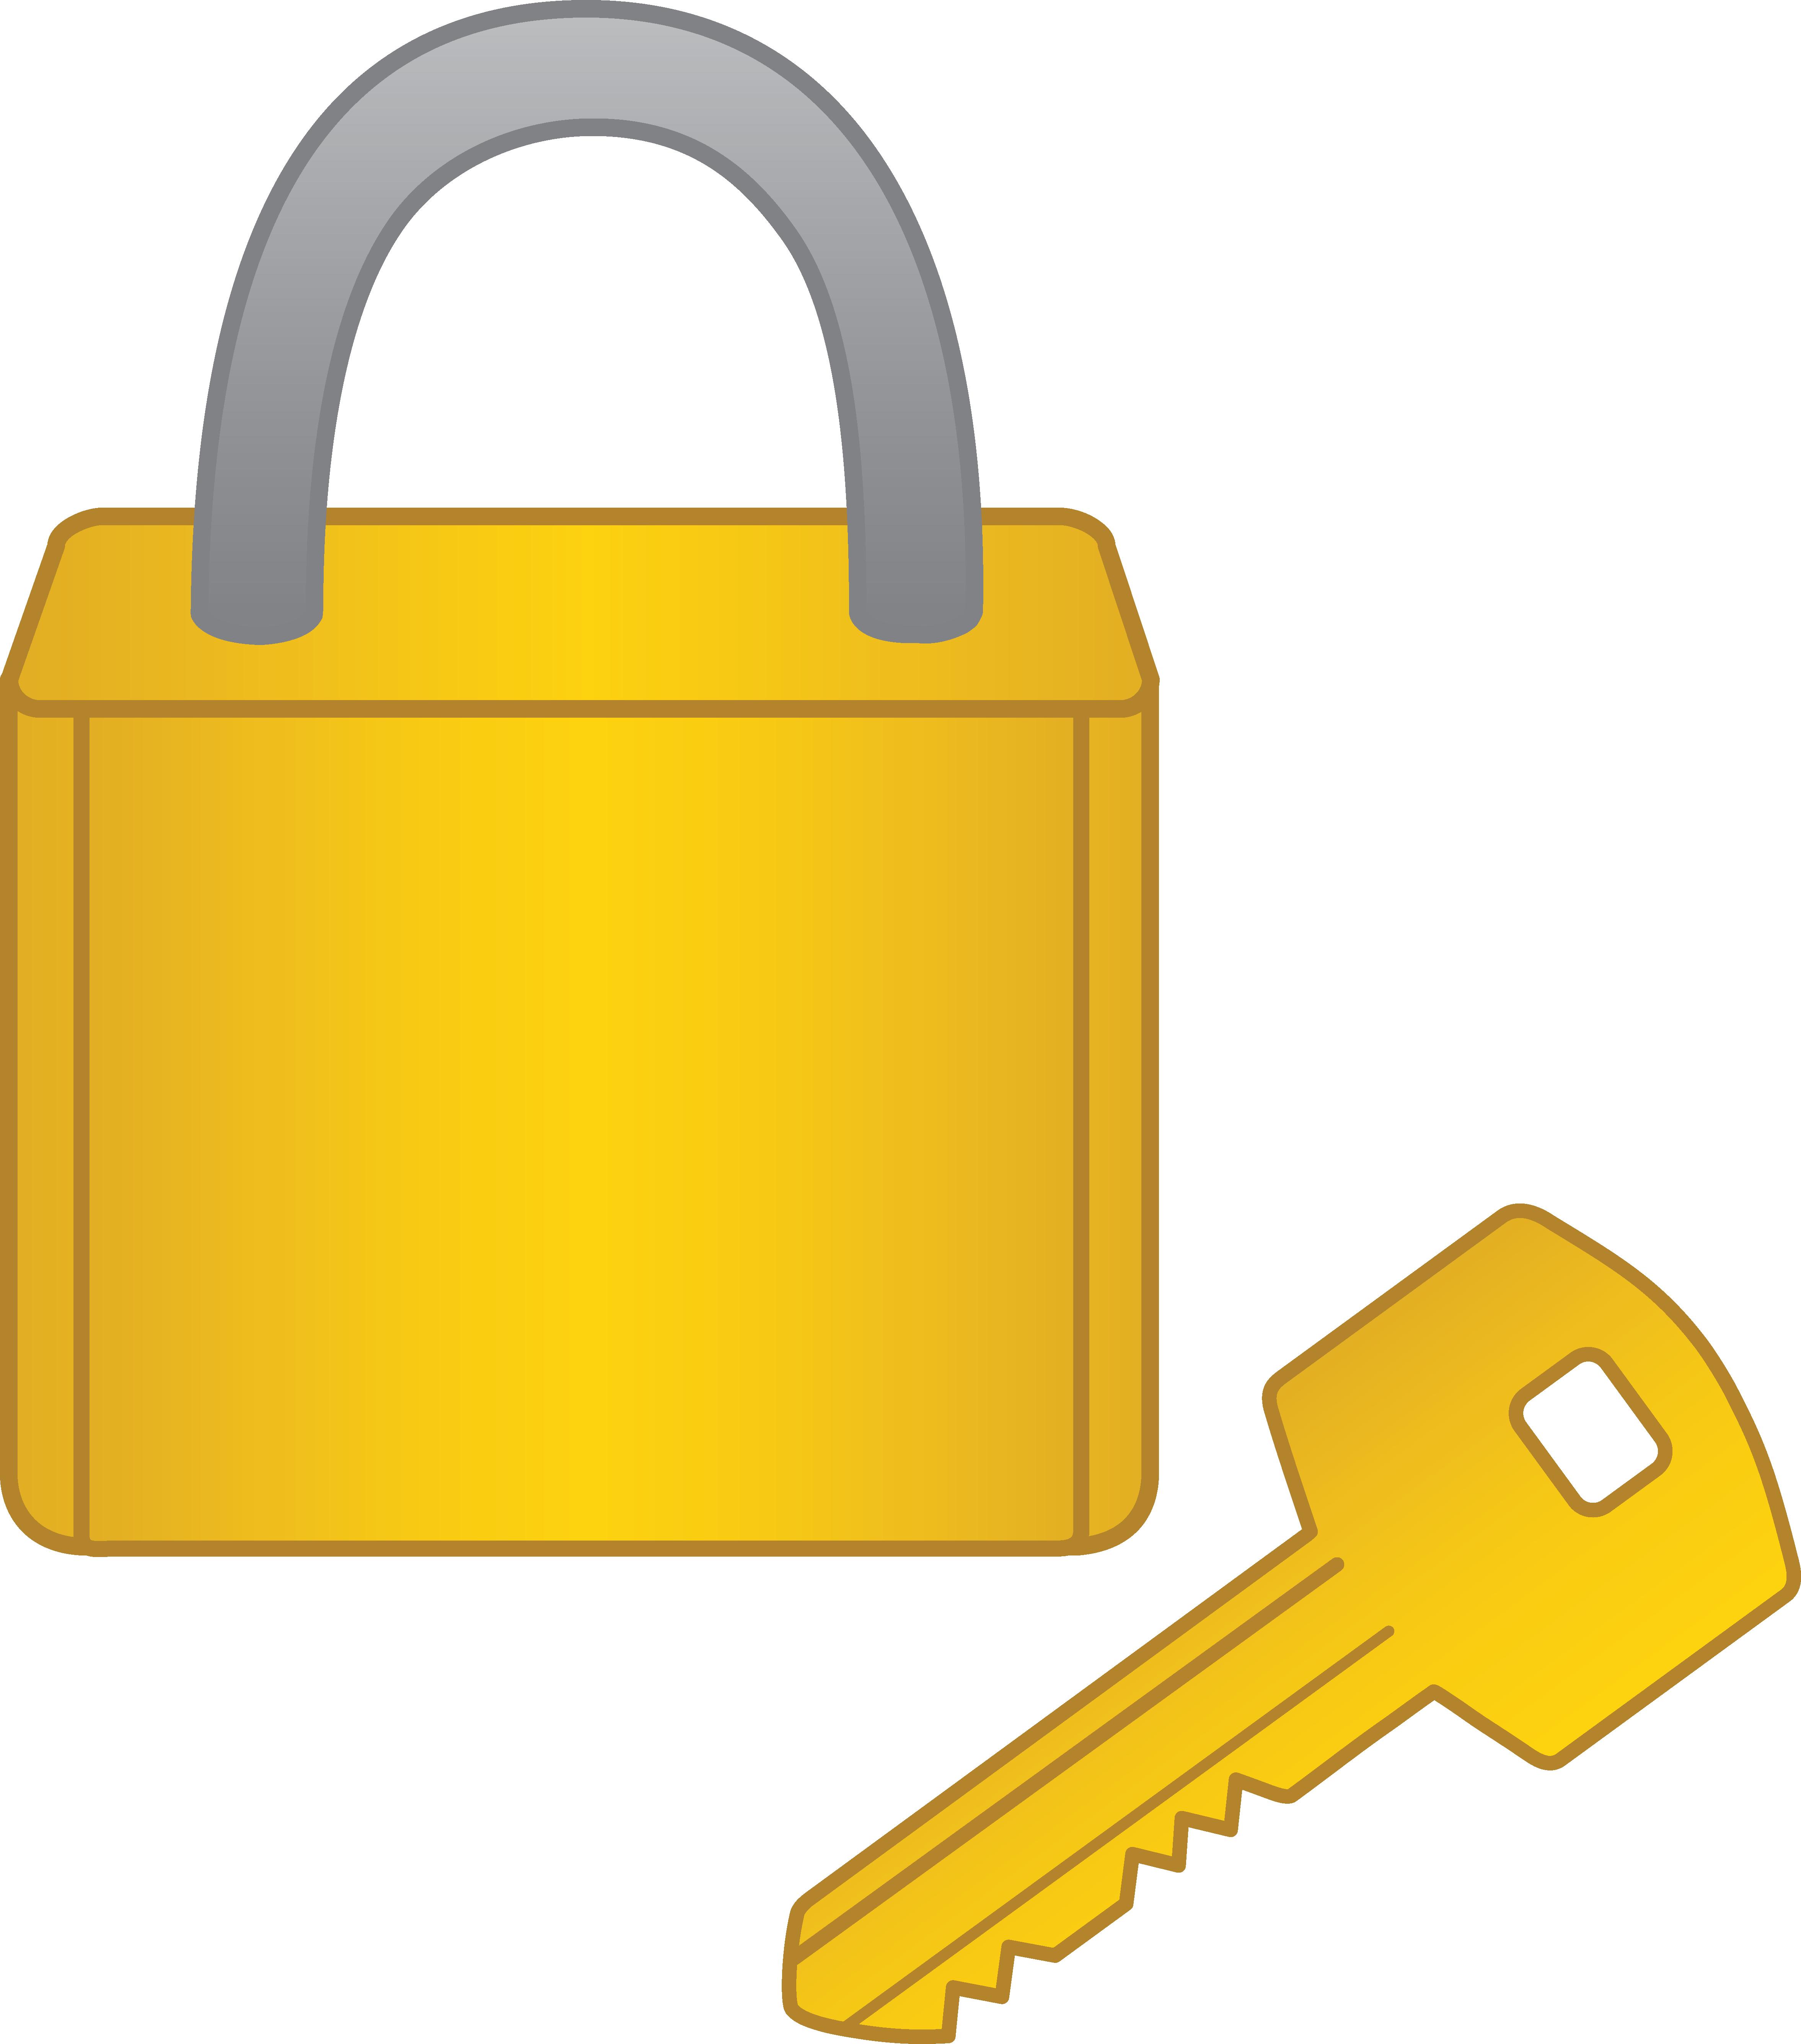 4707x5343 Png Keys And Locks Transparent Png Images.